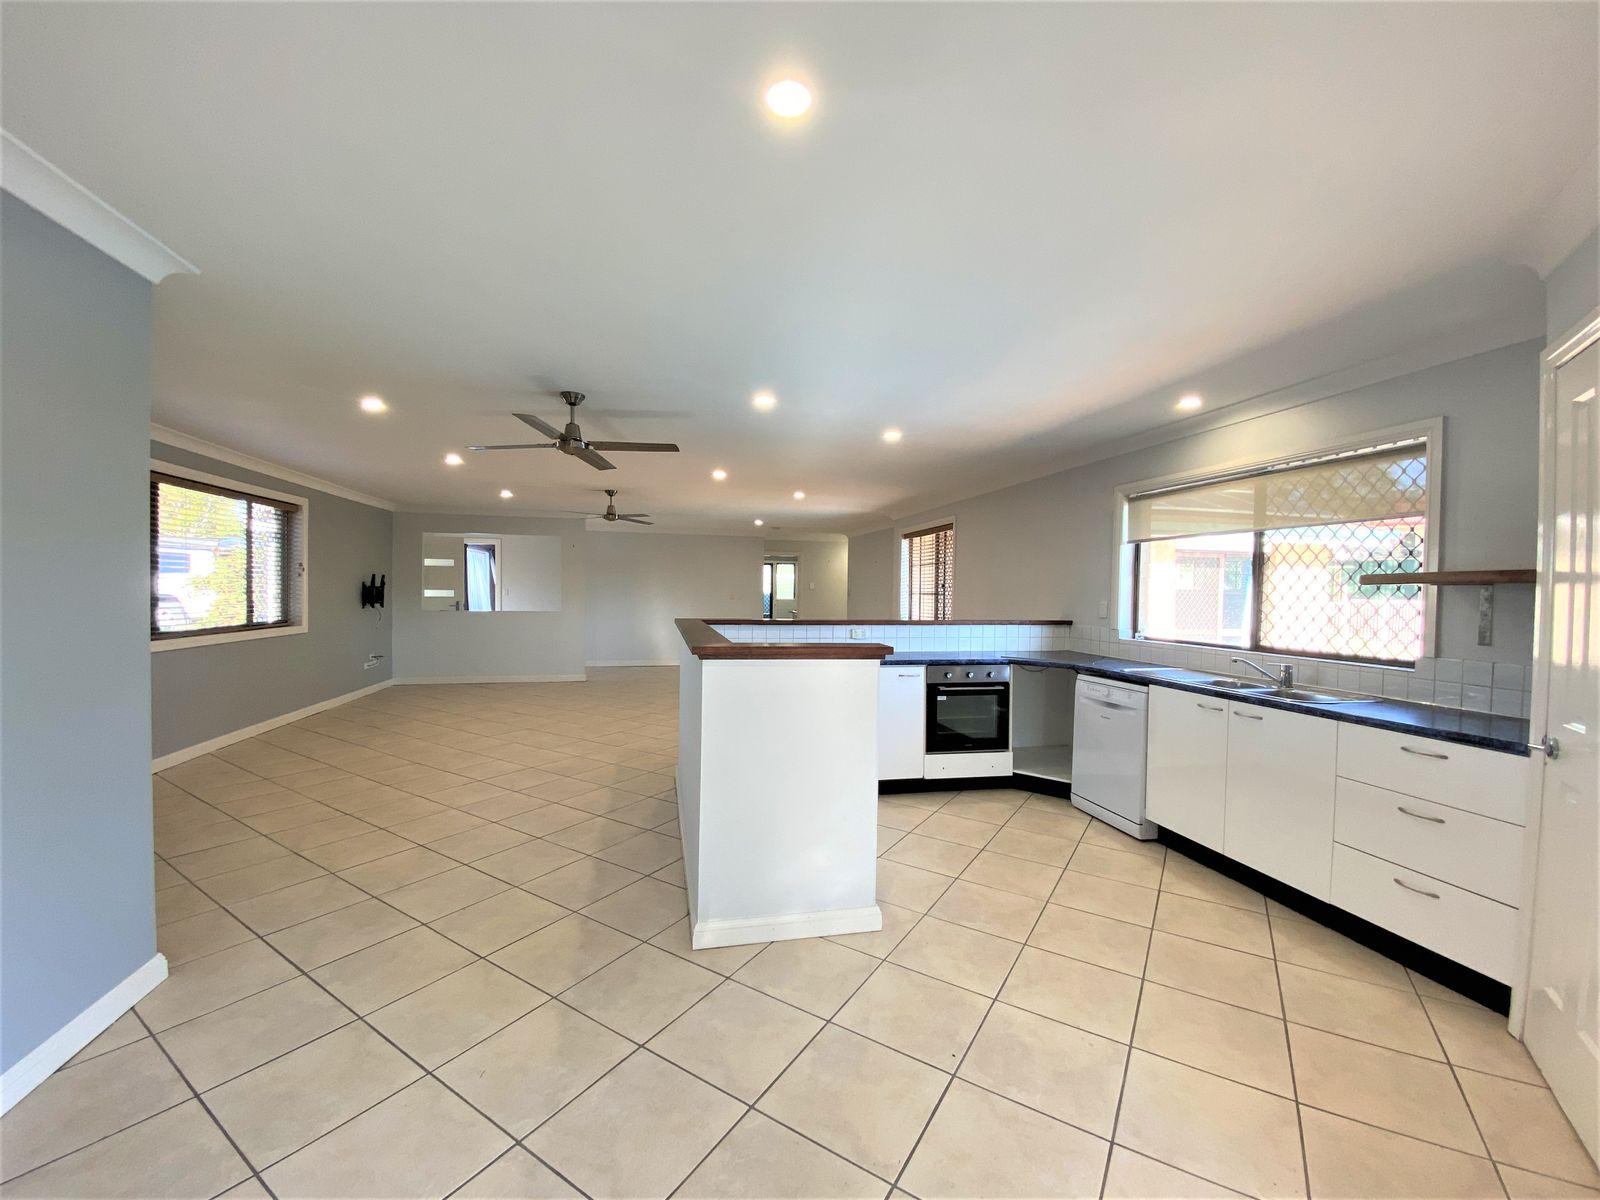 9 Visser Court, Rochedale South, QLD 4123